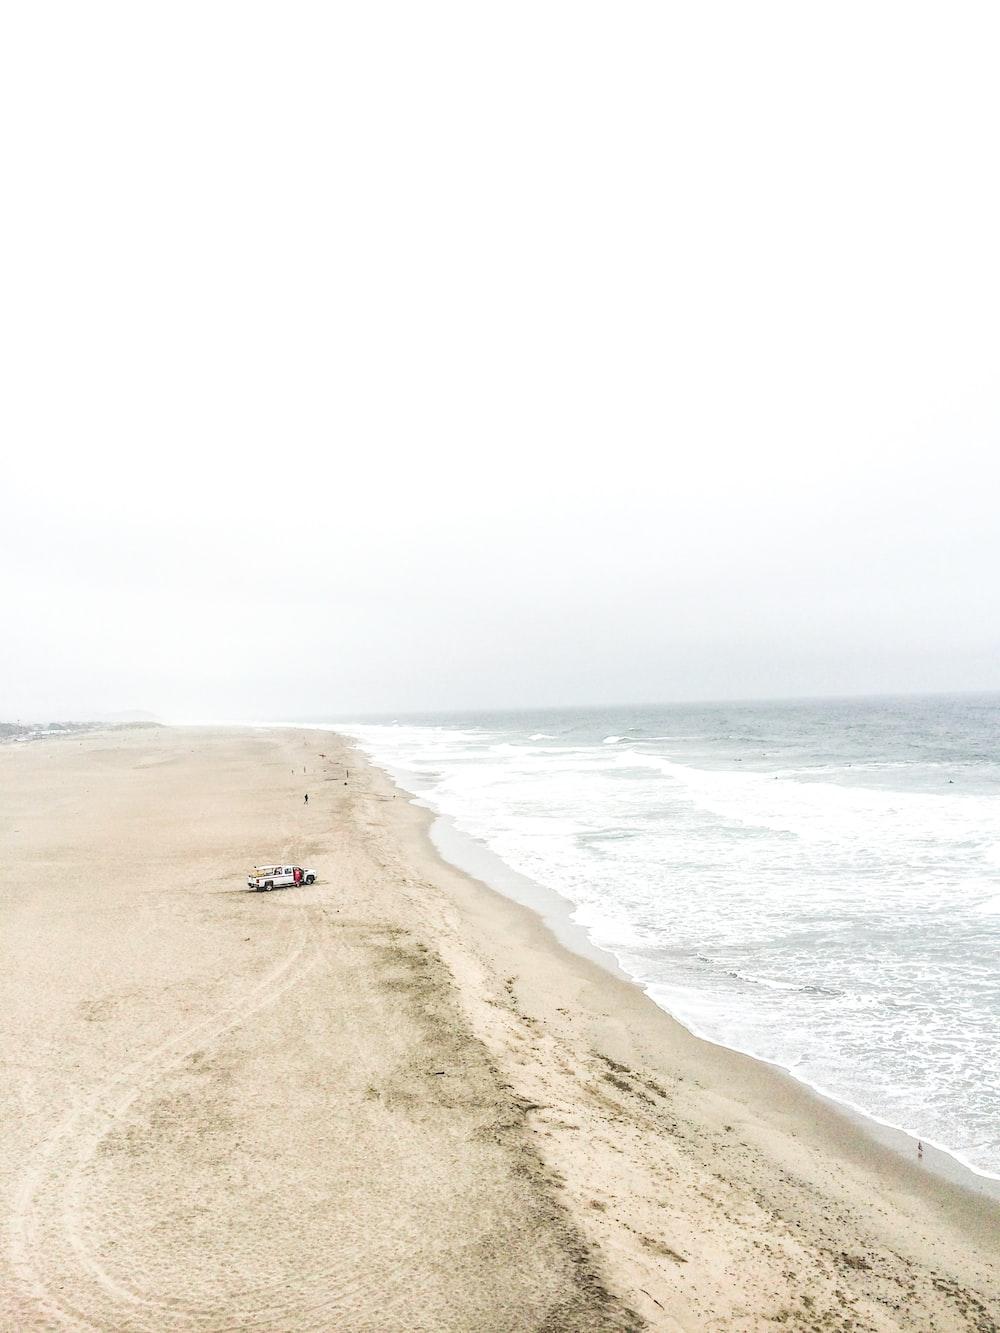 car near ocean